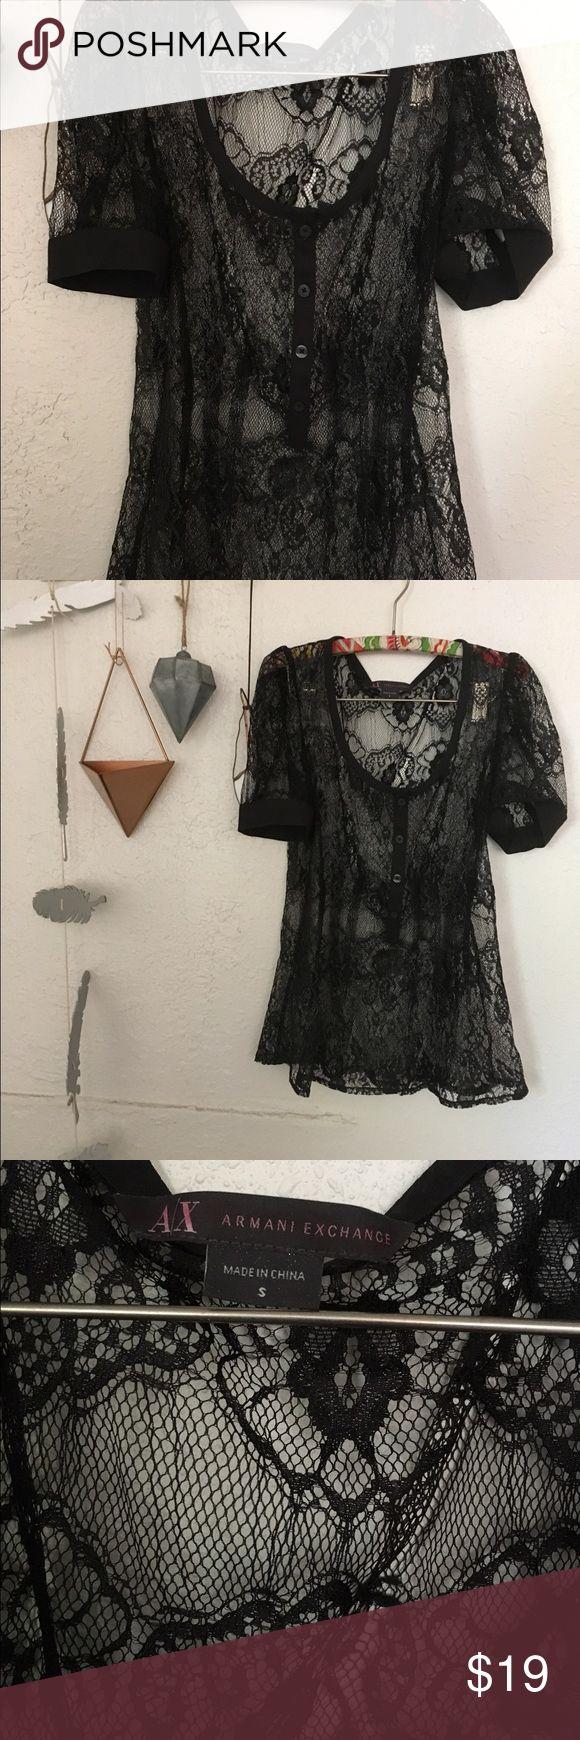 Armani Exchange Romantic Lace Blouse Like New,the lace is shiny!!! A/X Armani Exchange Tops Blouses